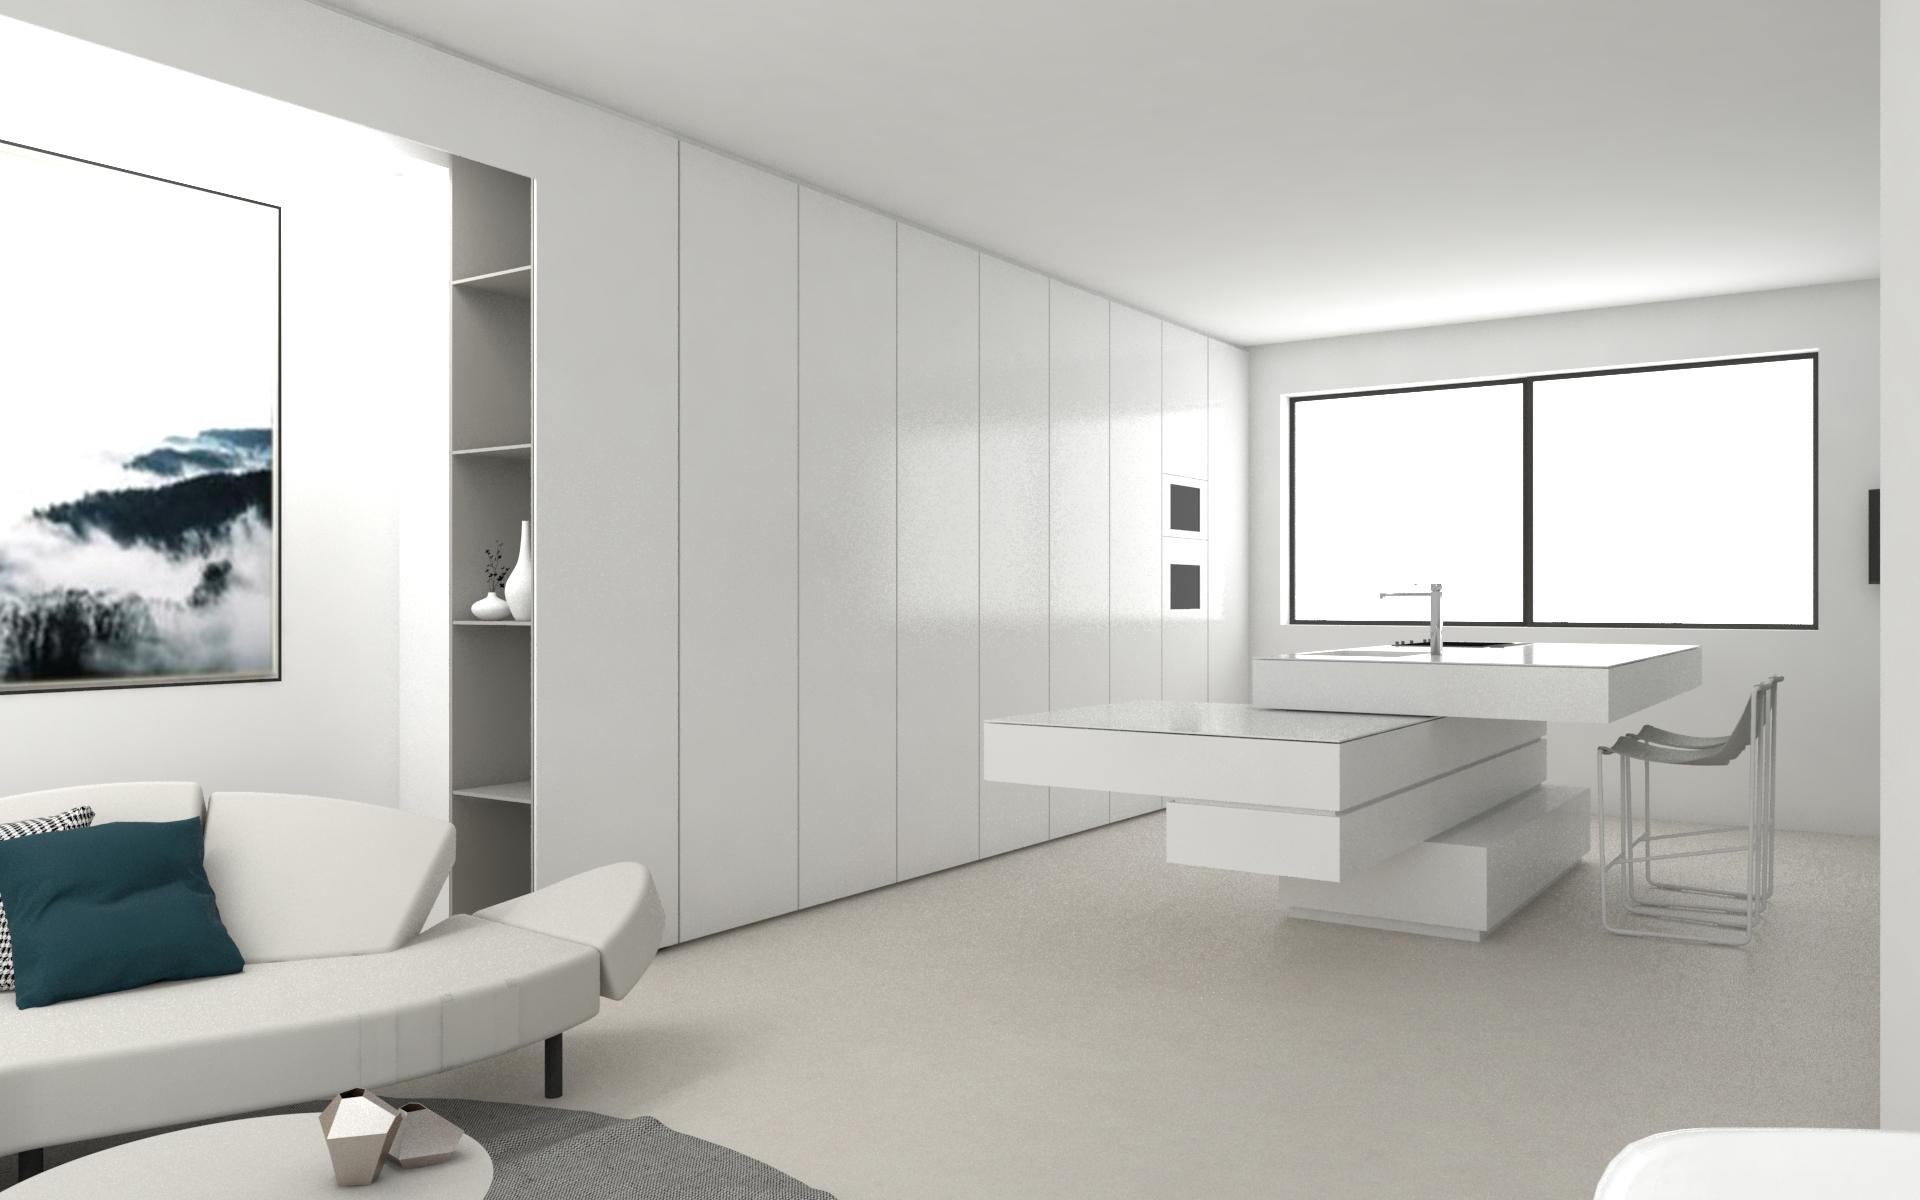 Casa-MR-_-DFG-Architetti-Associati-3